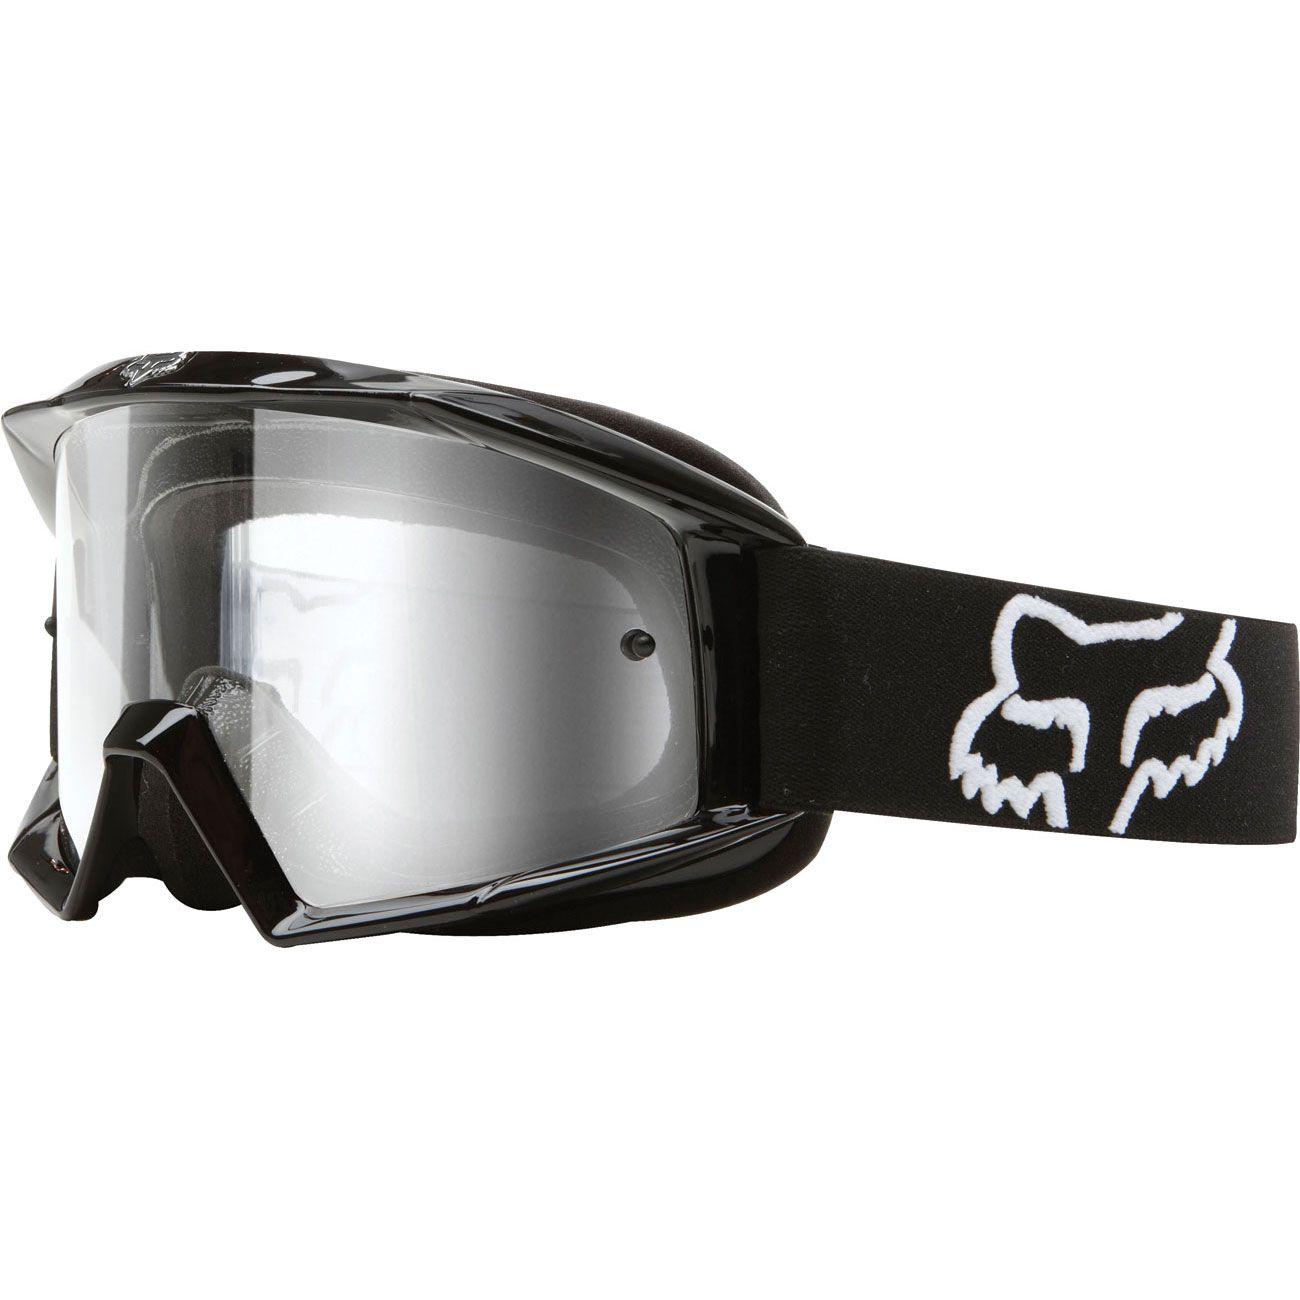 NEW Fox Racing Youth MX Main Race Black Kids Dirt Bike Motocross Goggles